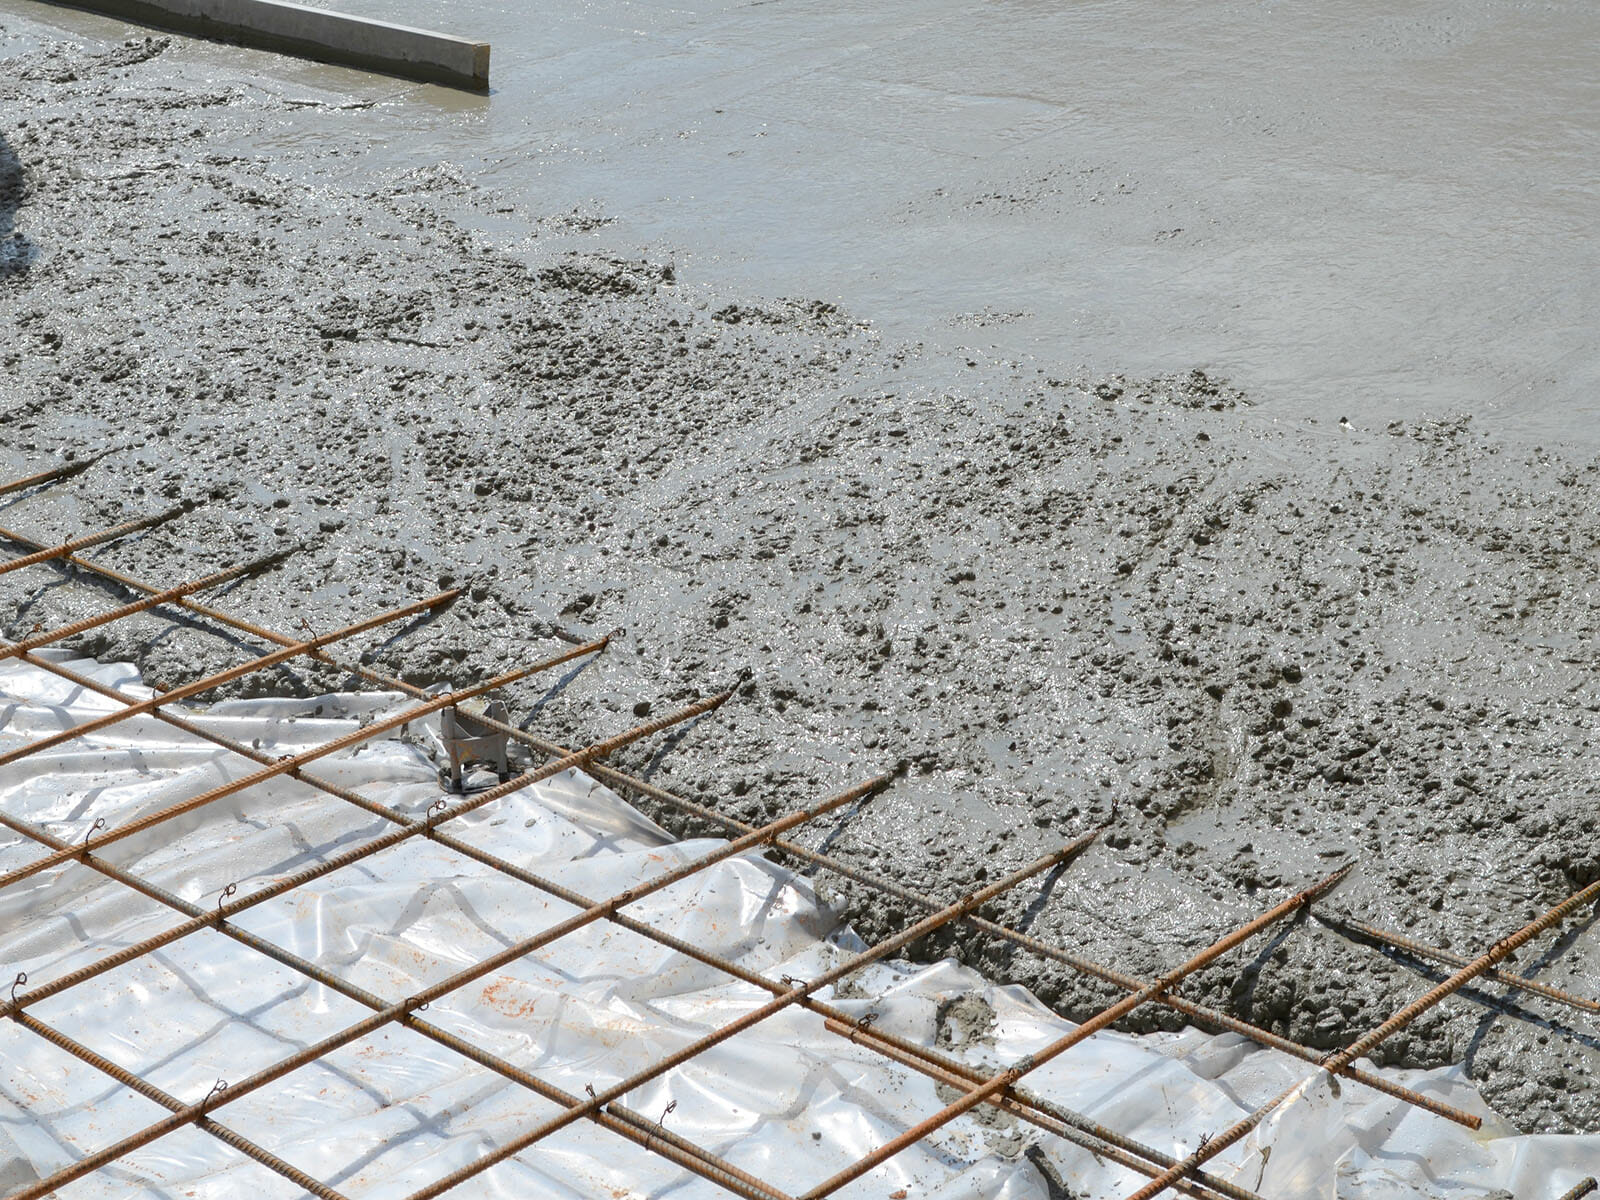 Concrete poured over rebar